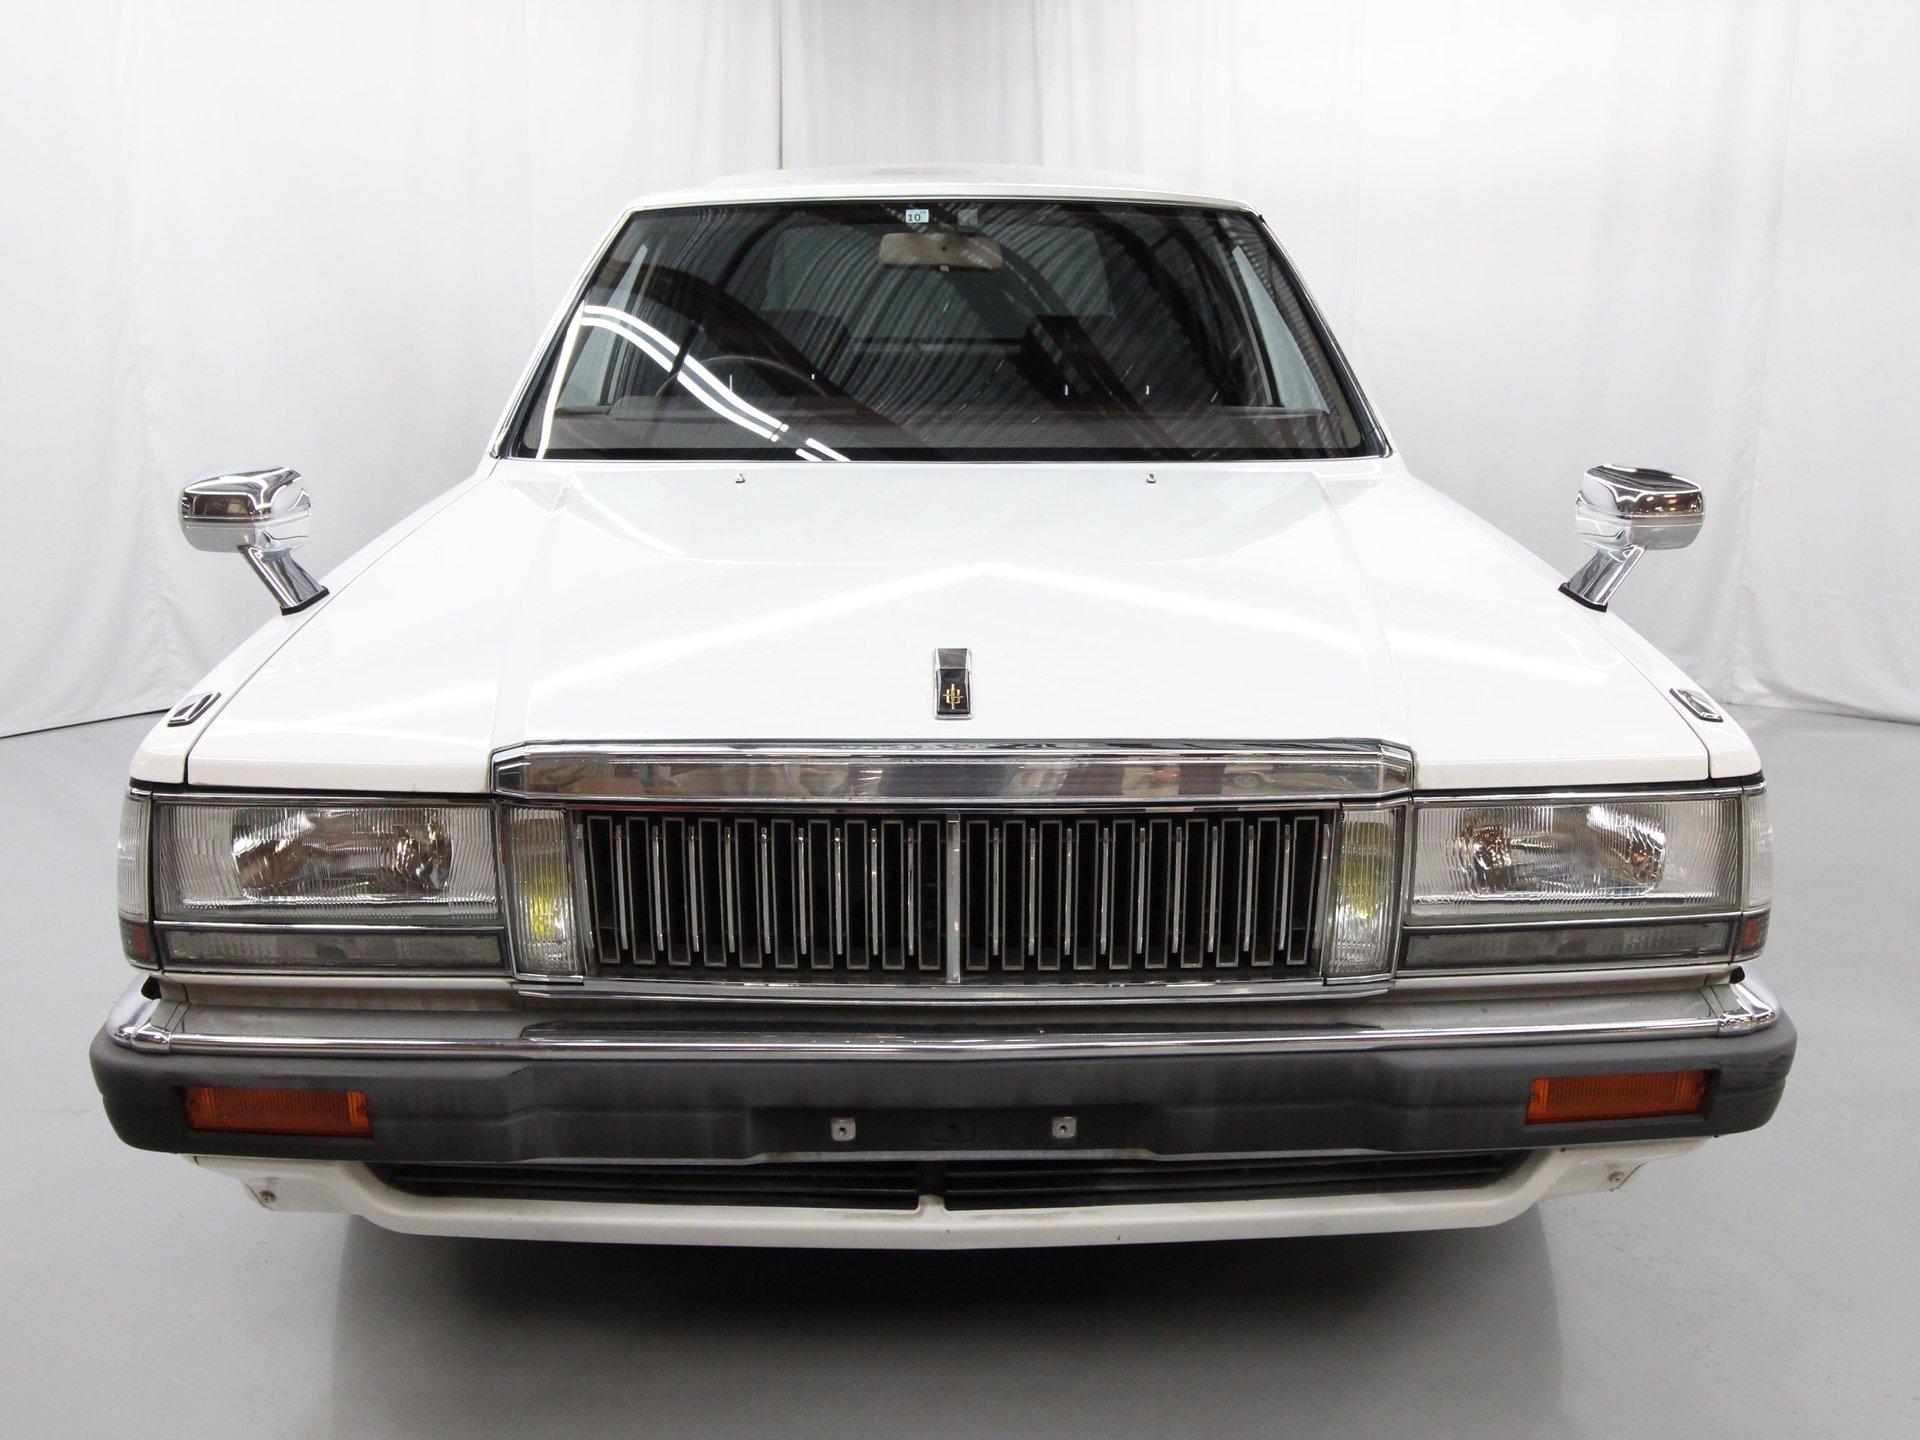 1993 Nissan Cedric